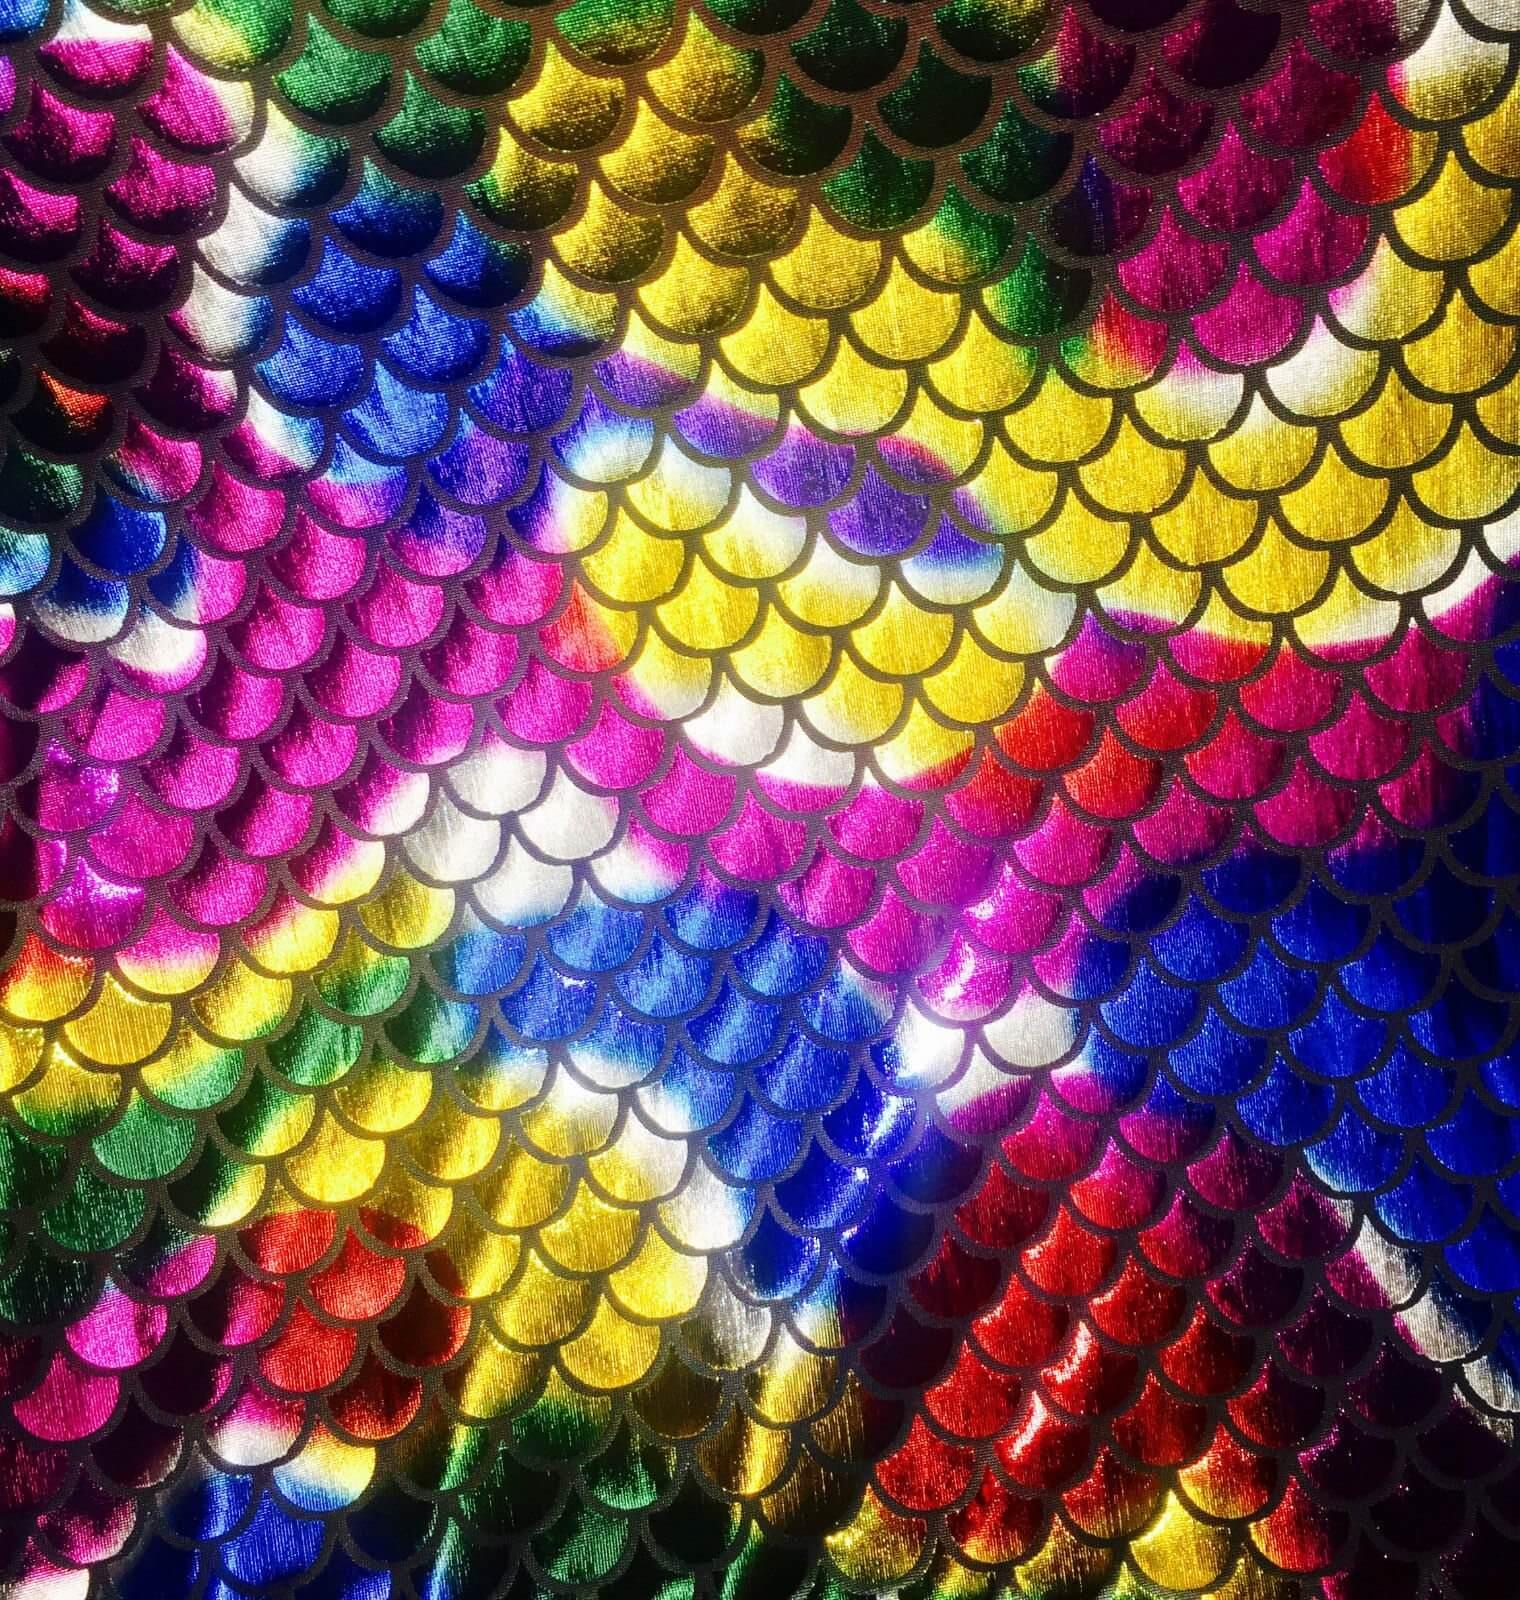 mermaid-scale-fabric-fish-tail-material-2-w-stretch-spandex-57-145cm-wide-rainbow-5b6b63581.jpg